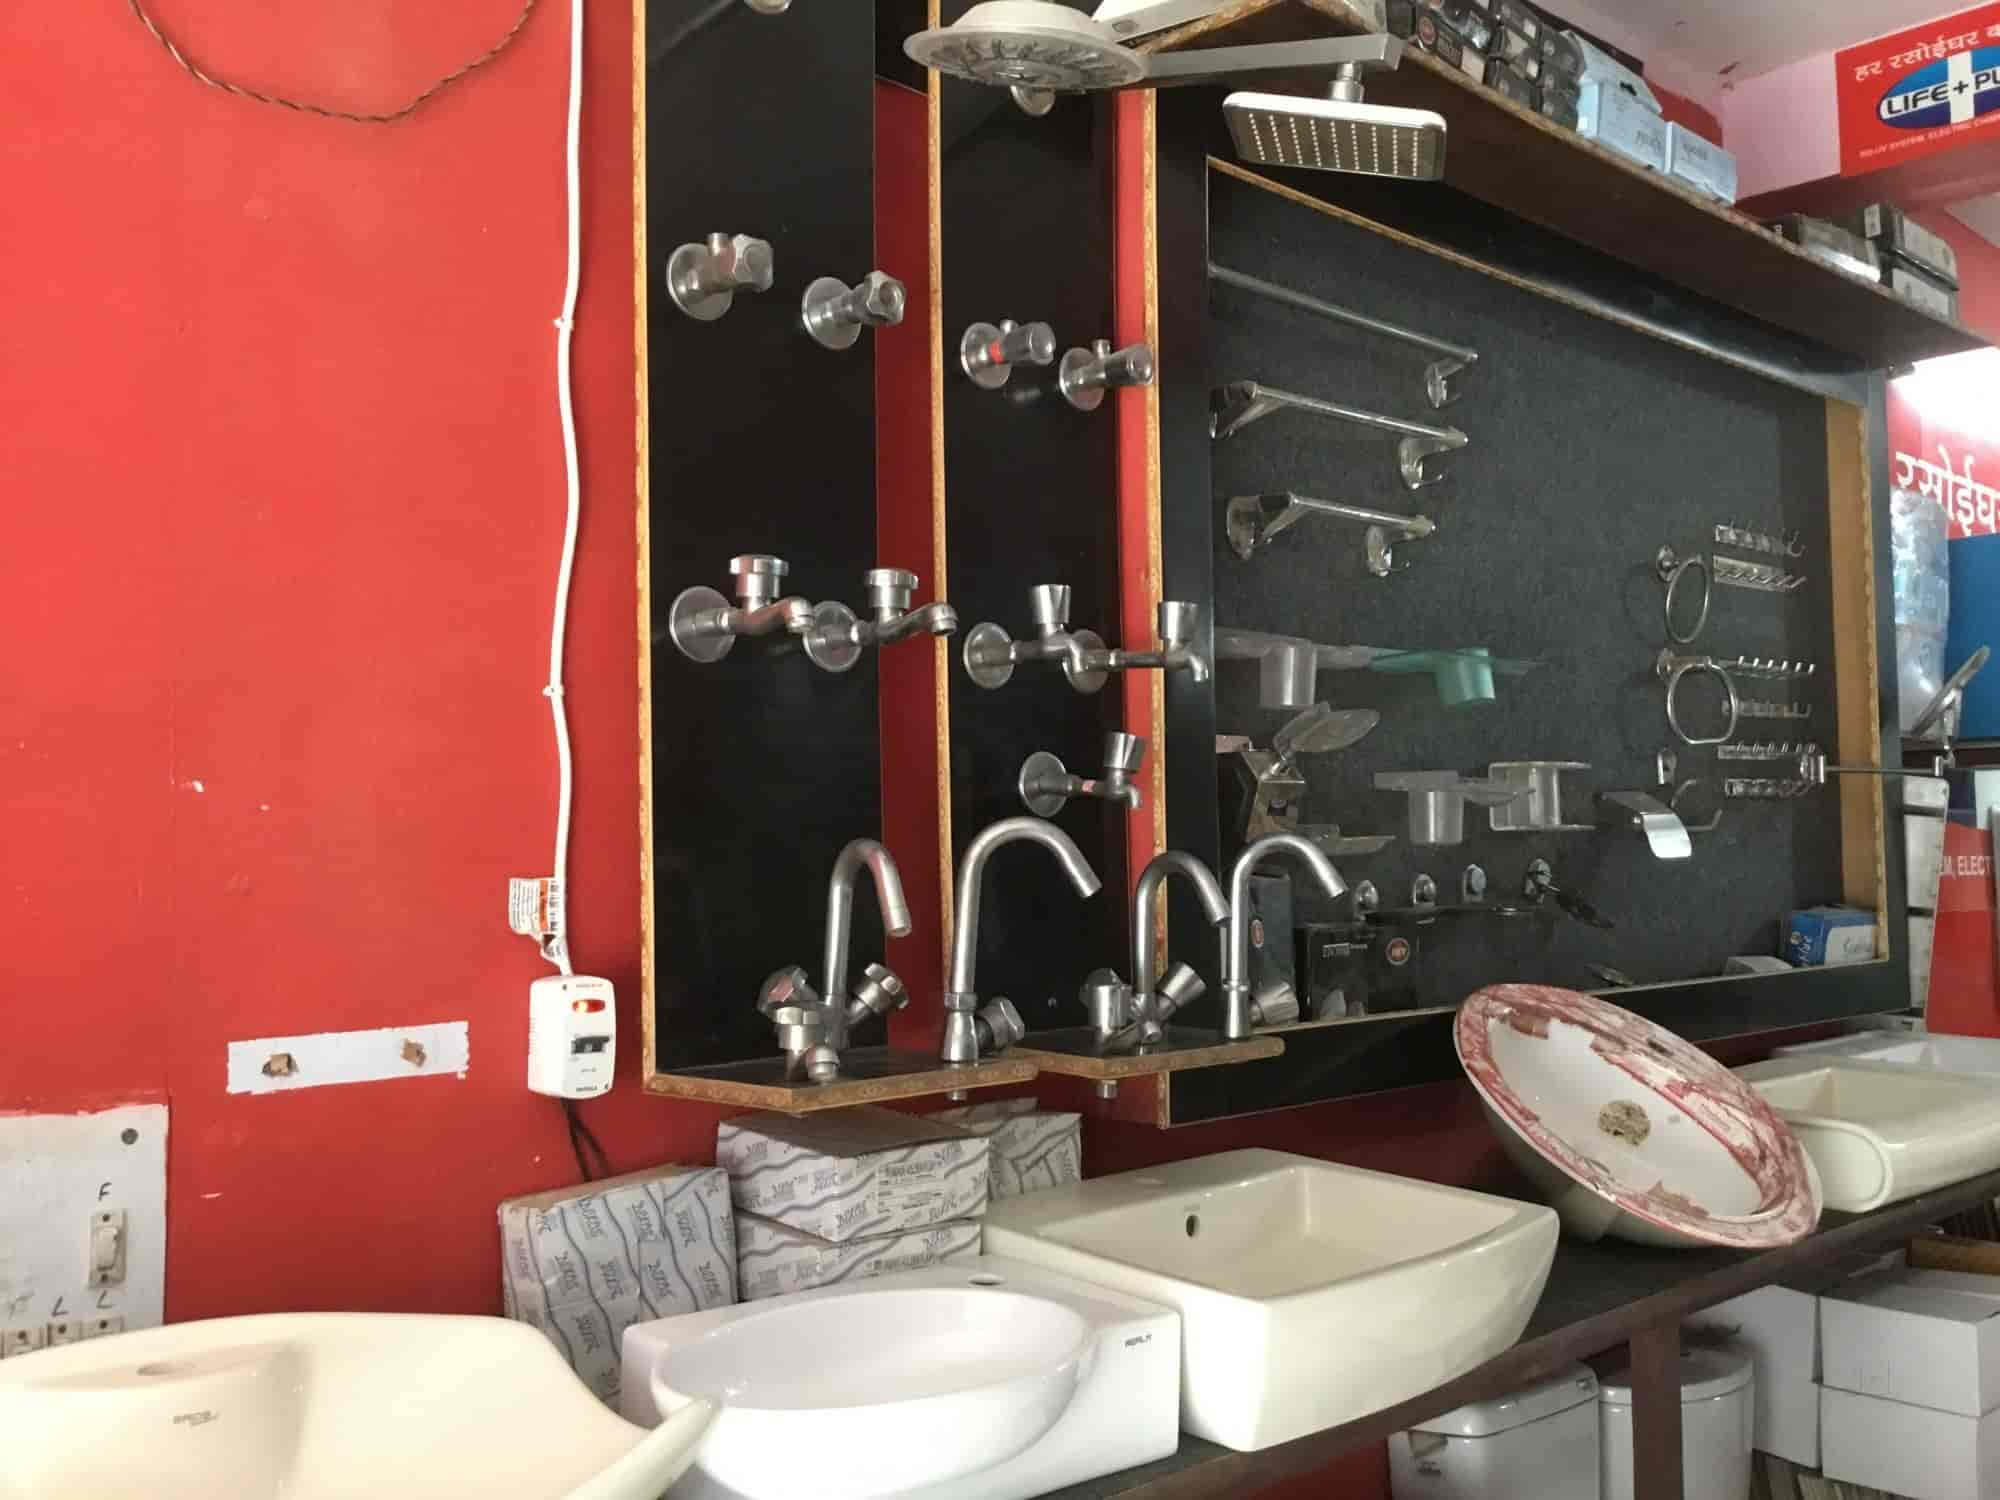 Unique Bath Sanitary Ensign - Luxurious Bathtub Ideas and ...